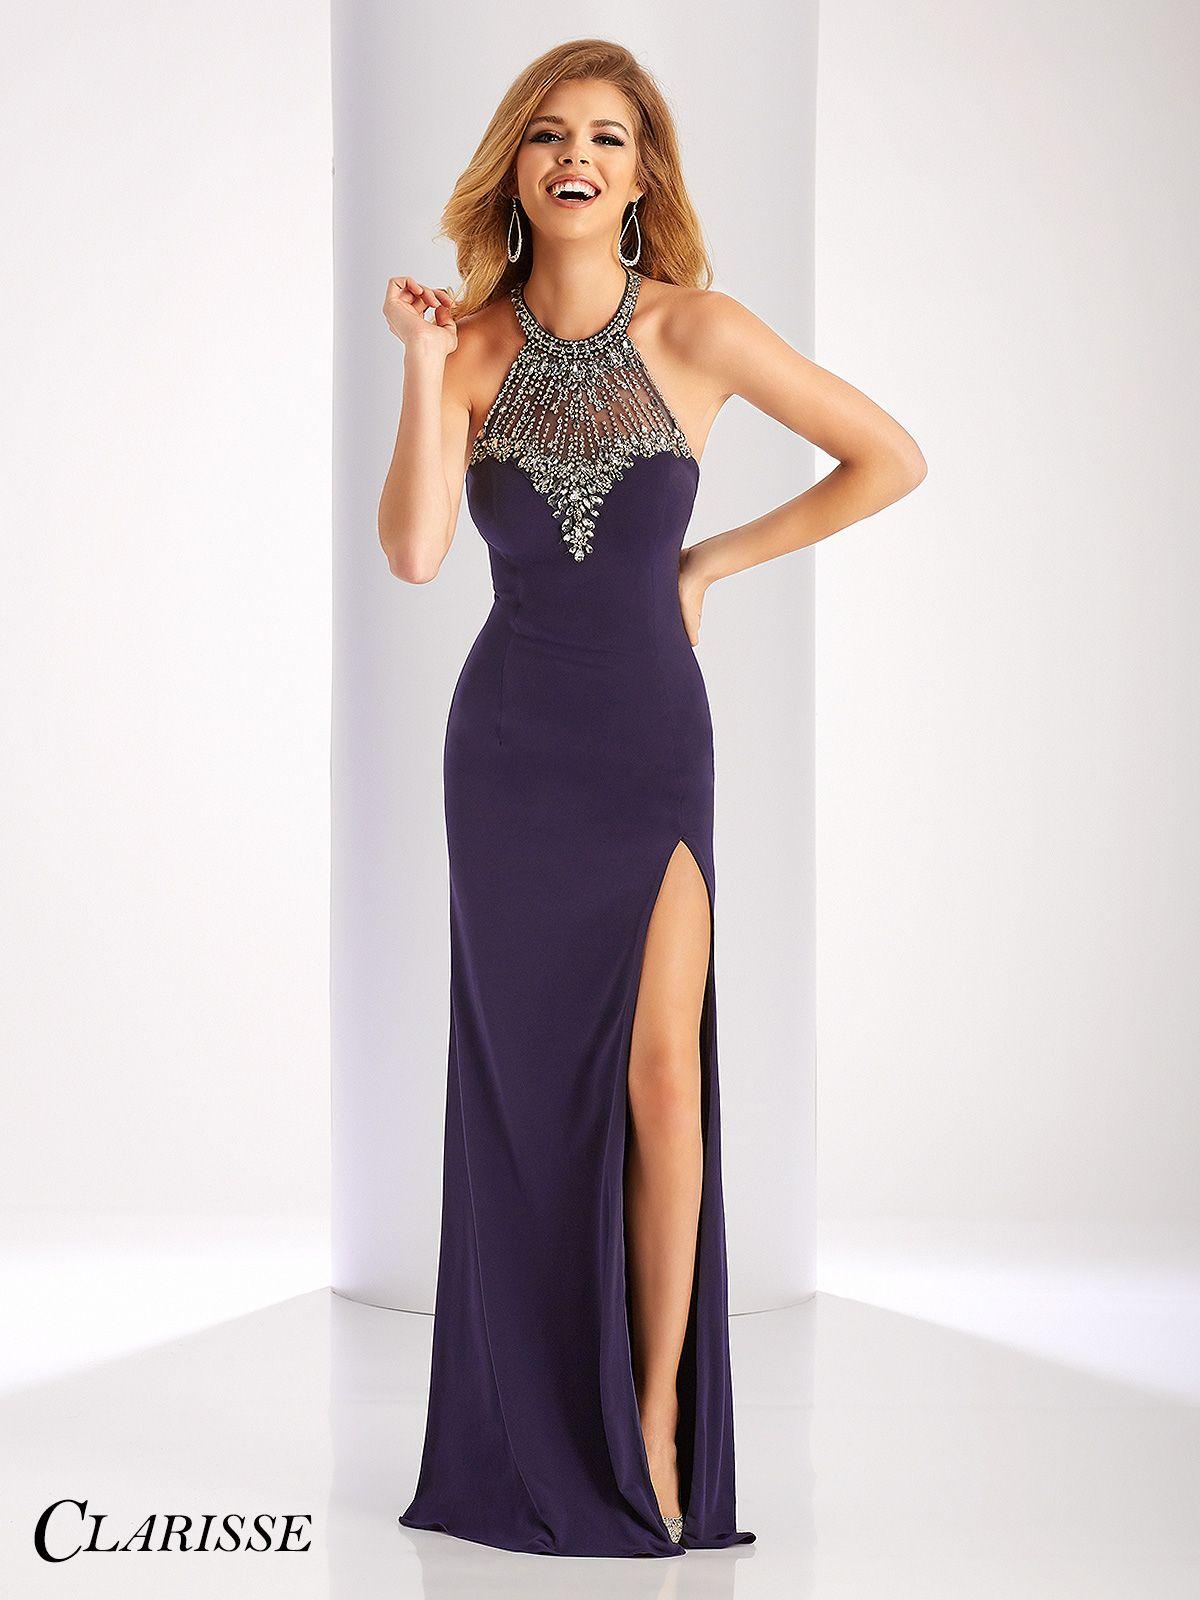 Clarisse Jeweled Collar Prom Dress 3078 | Pinterest | Kleider